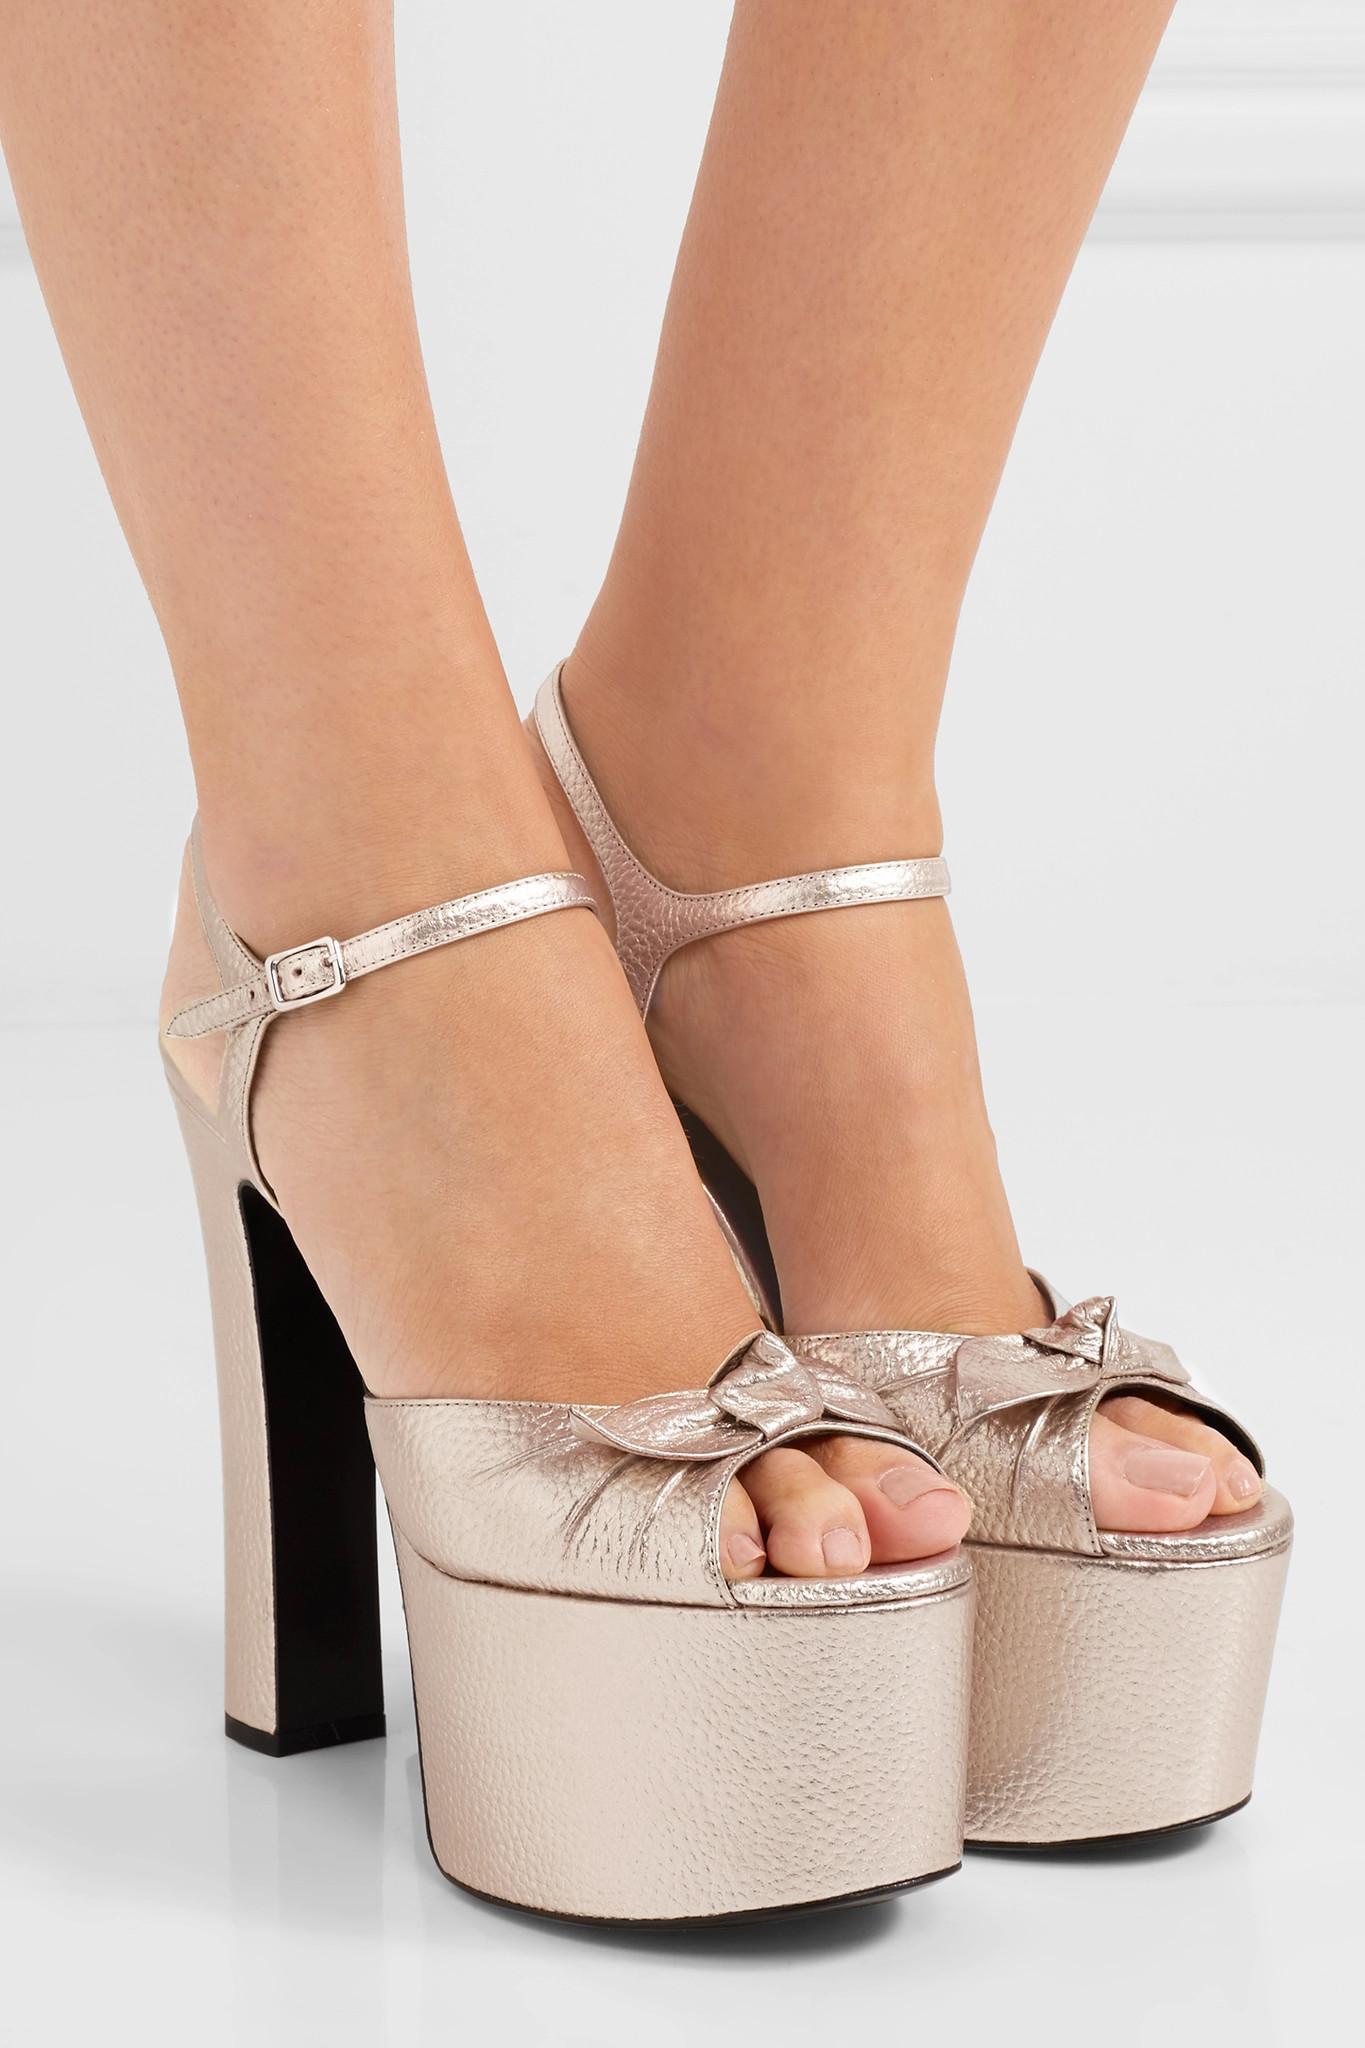 a087f2d883b4 Saint Laurent Embellished Leather Sandals